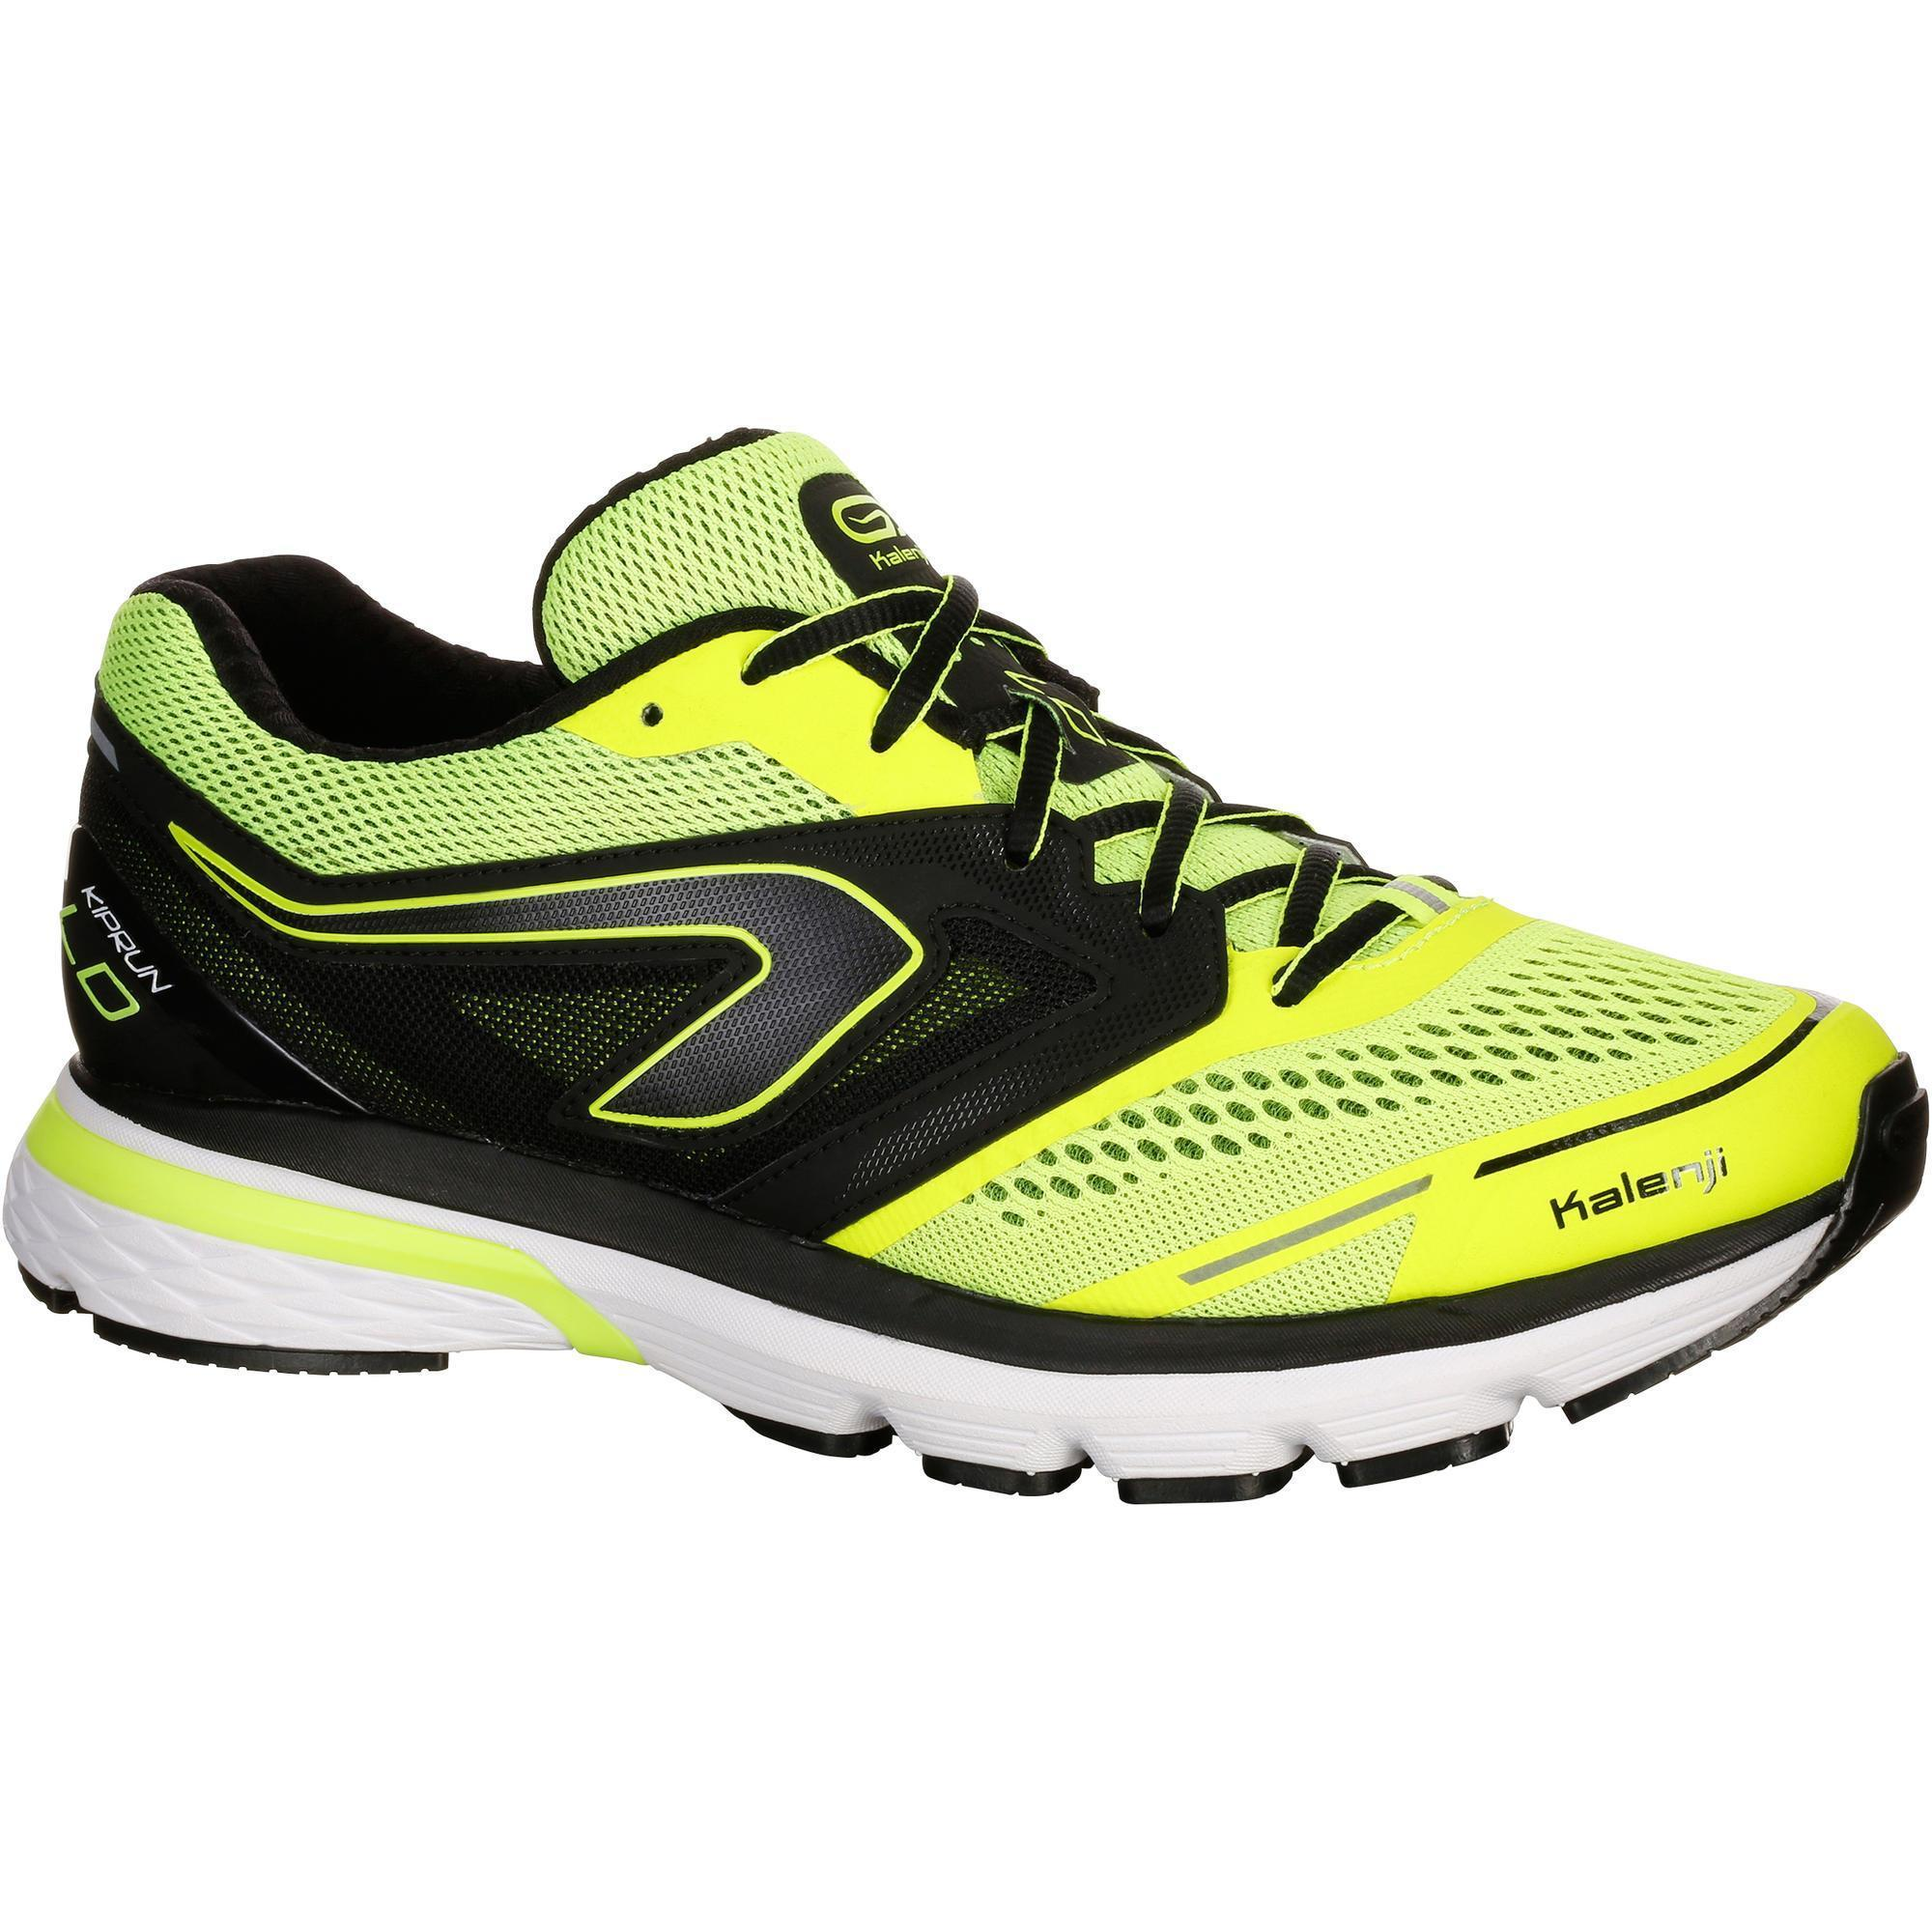 decathlon chaussures running new balance